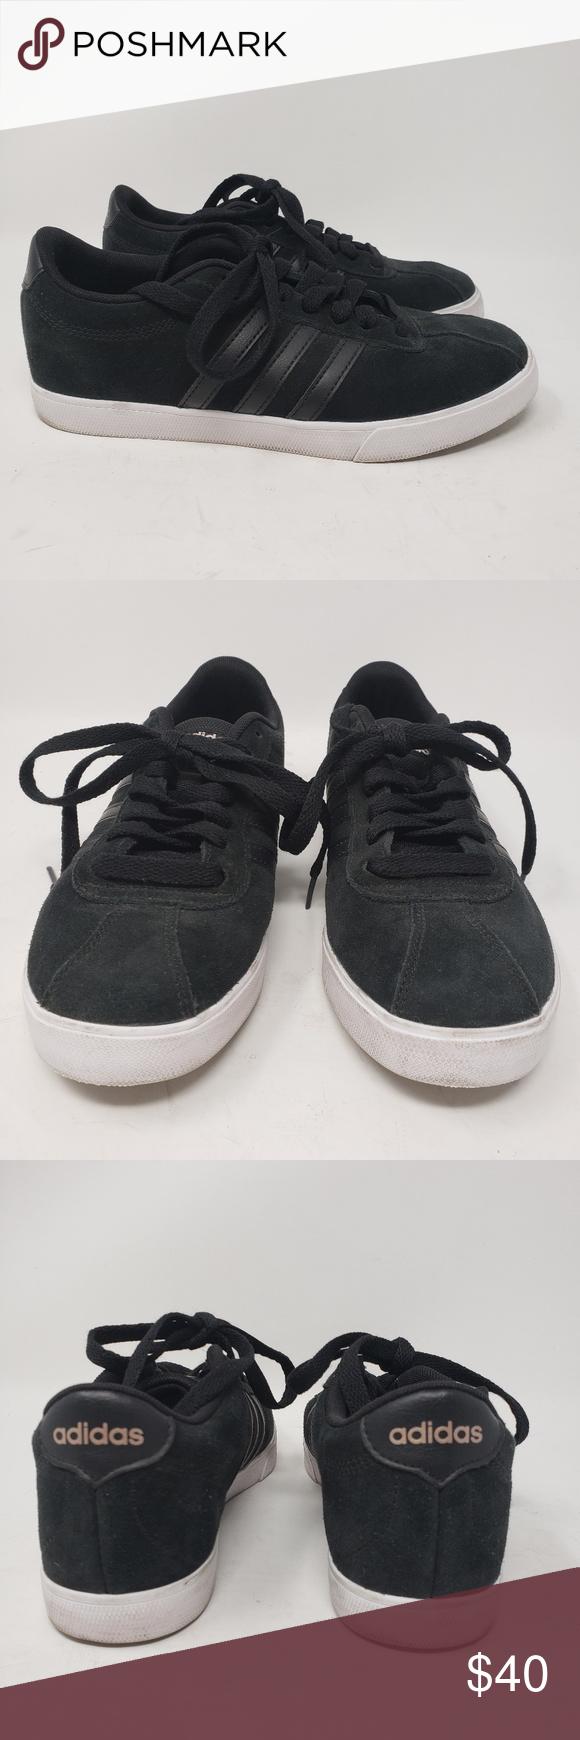 Women's Adidas black suede sneakers size 6 | Adidas women, Black ...